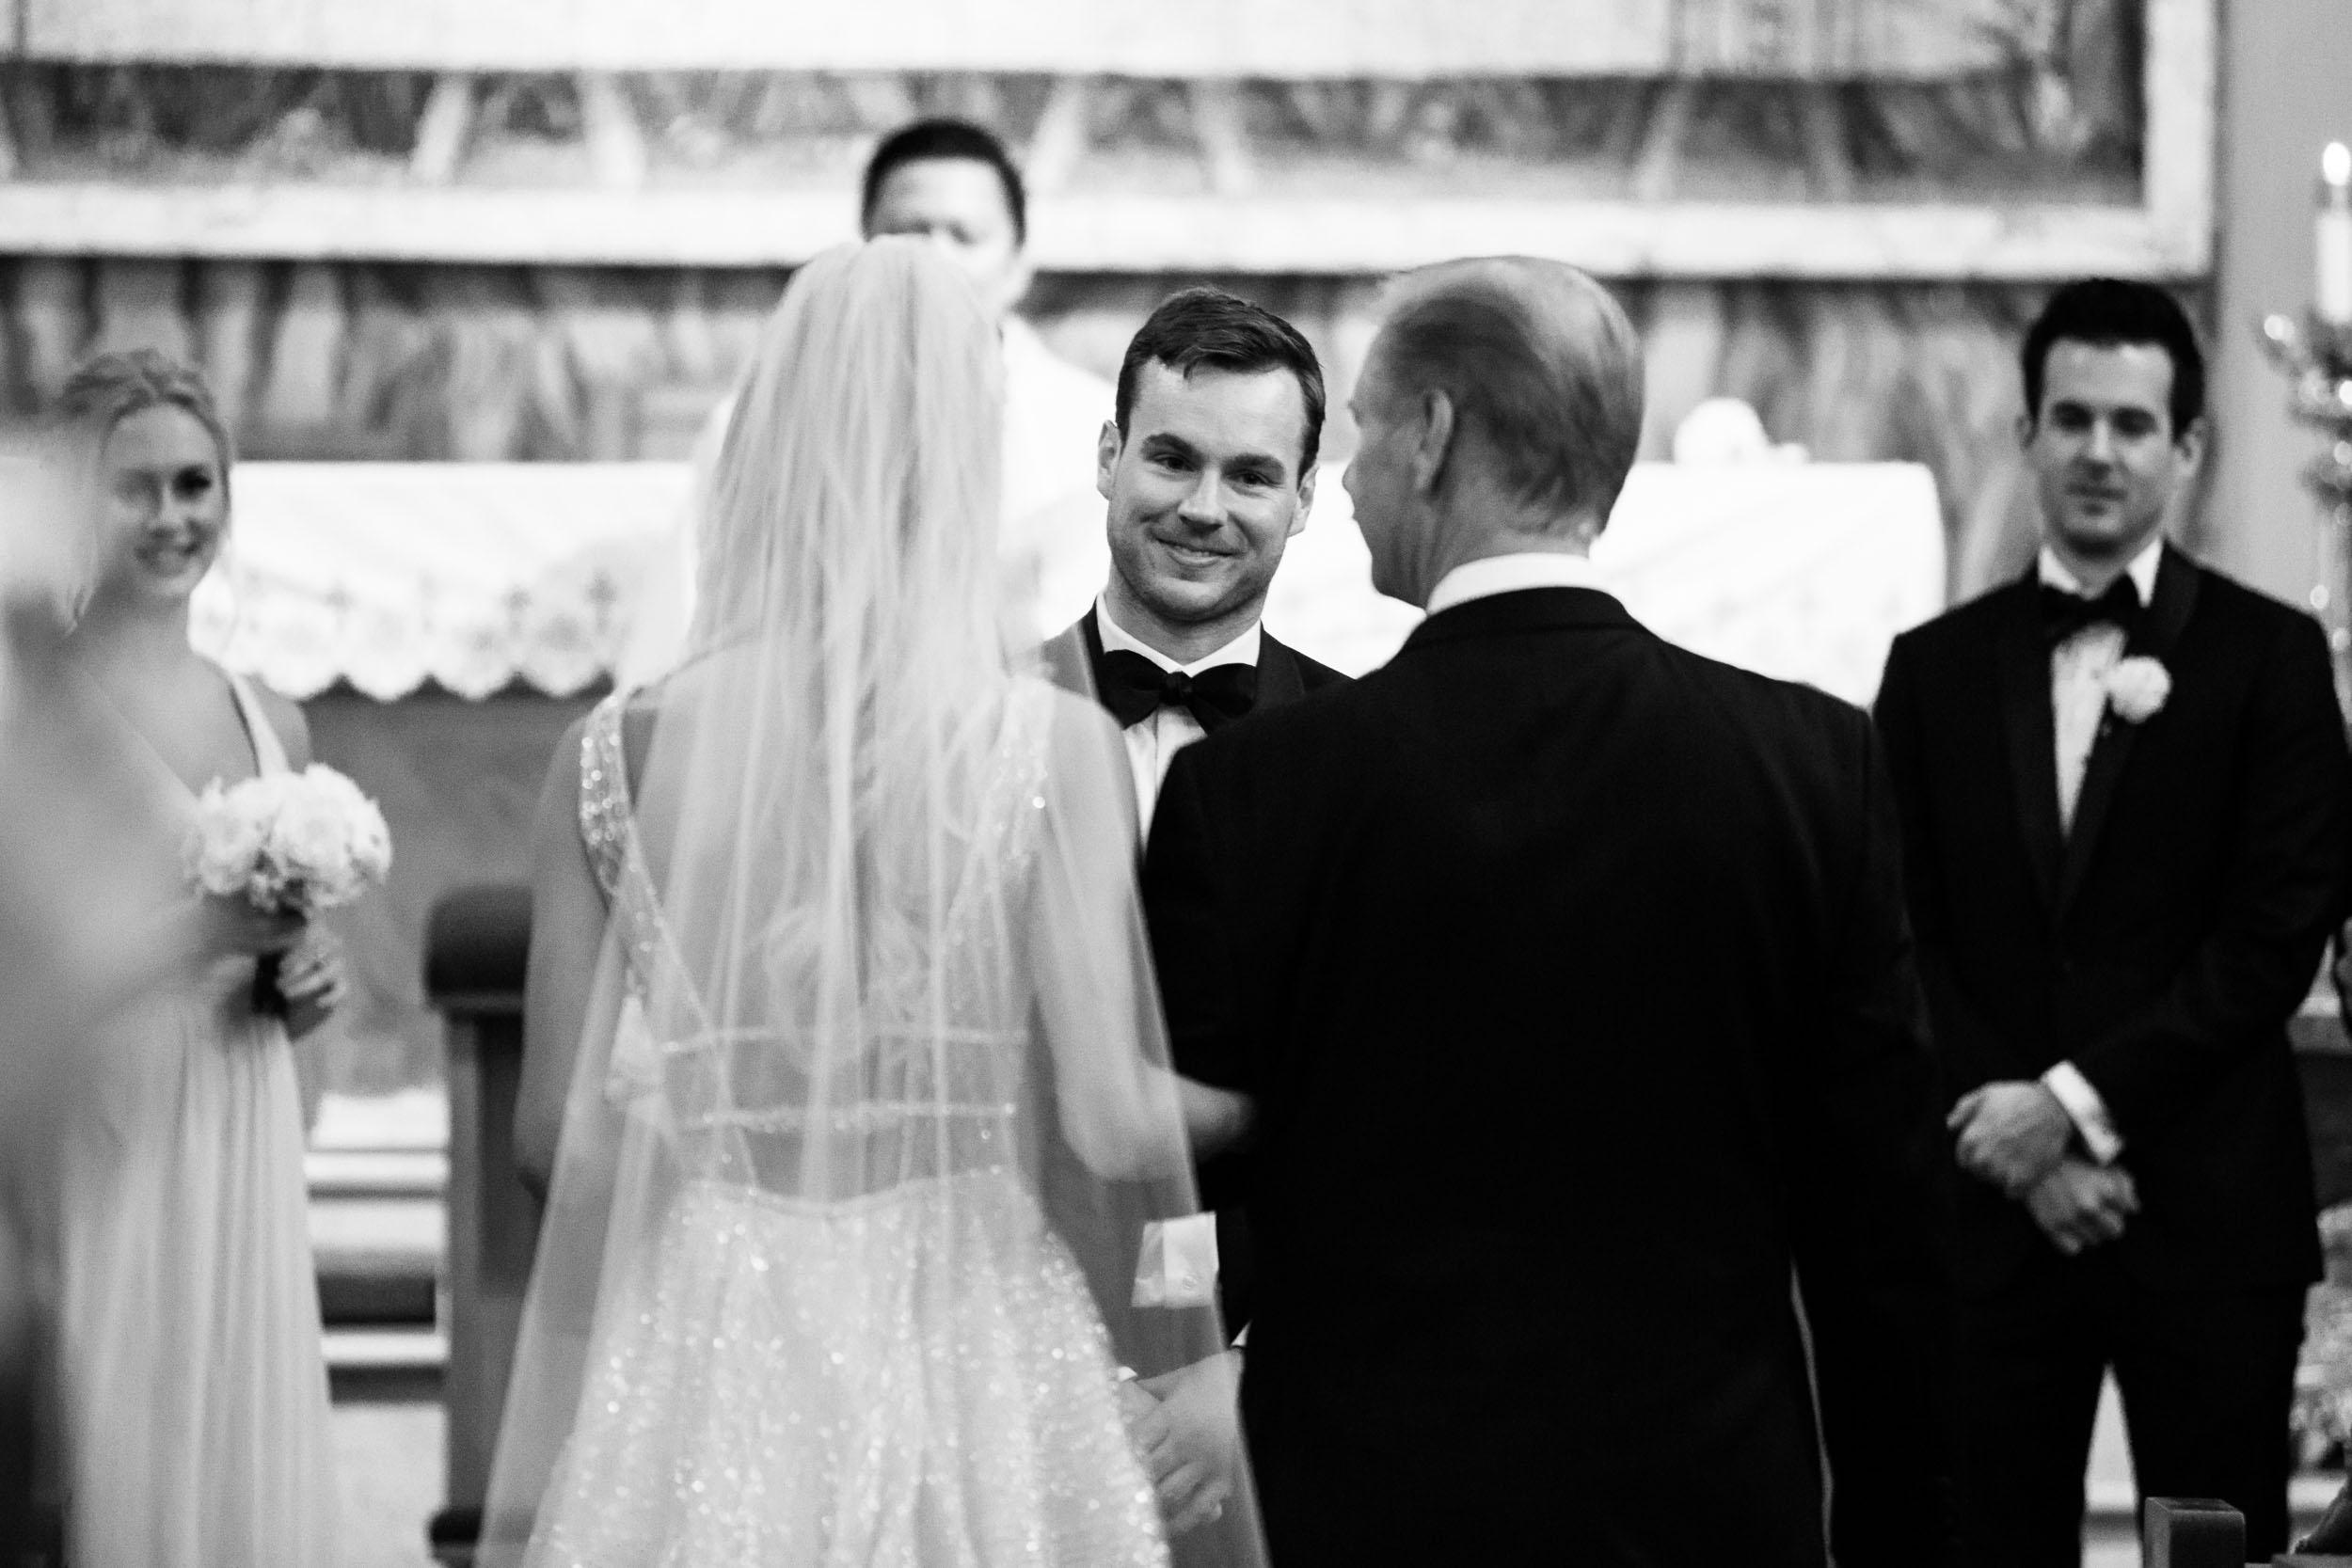 chicago-illuminating-co-wedding-photos-39.jpg